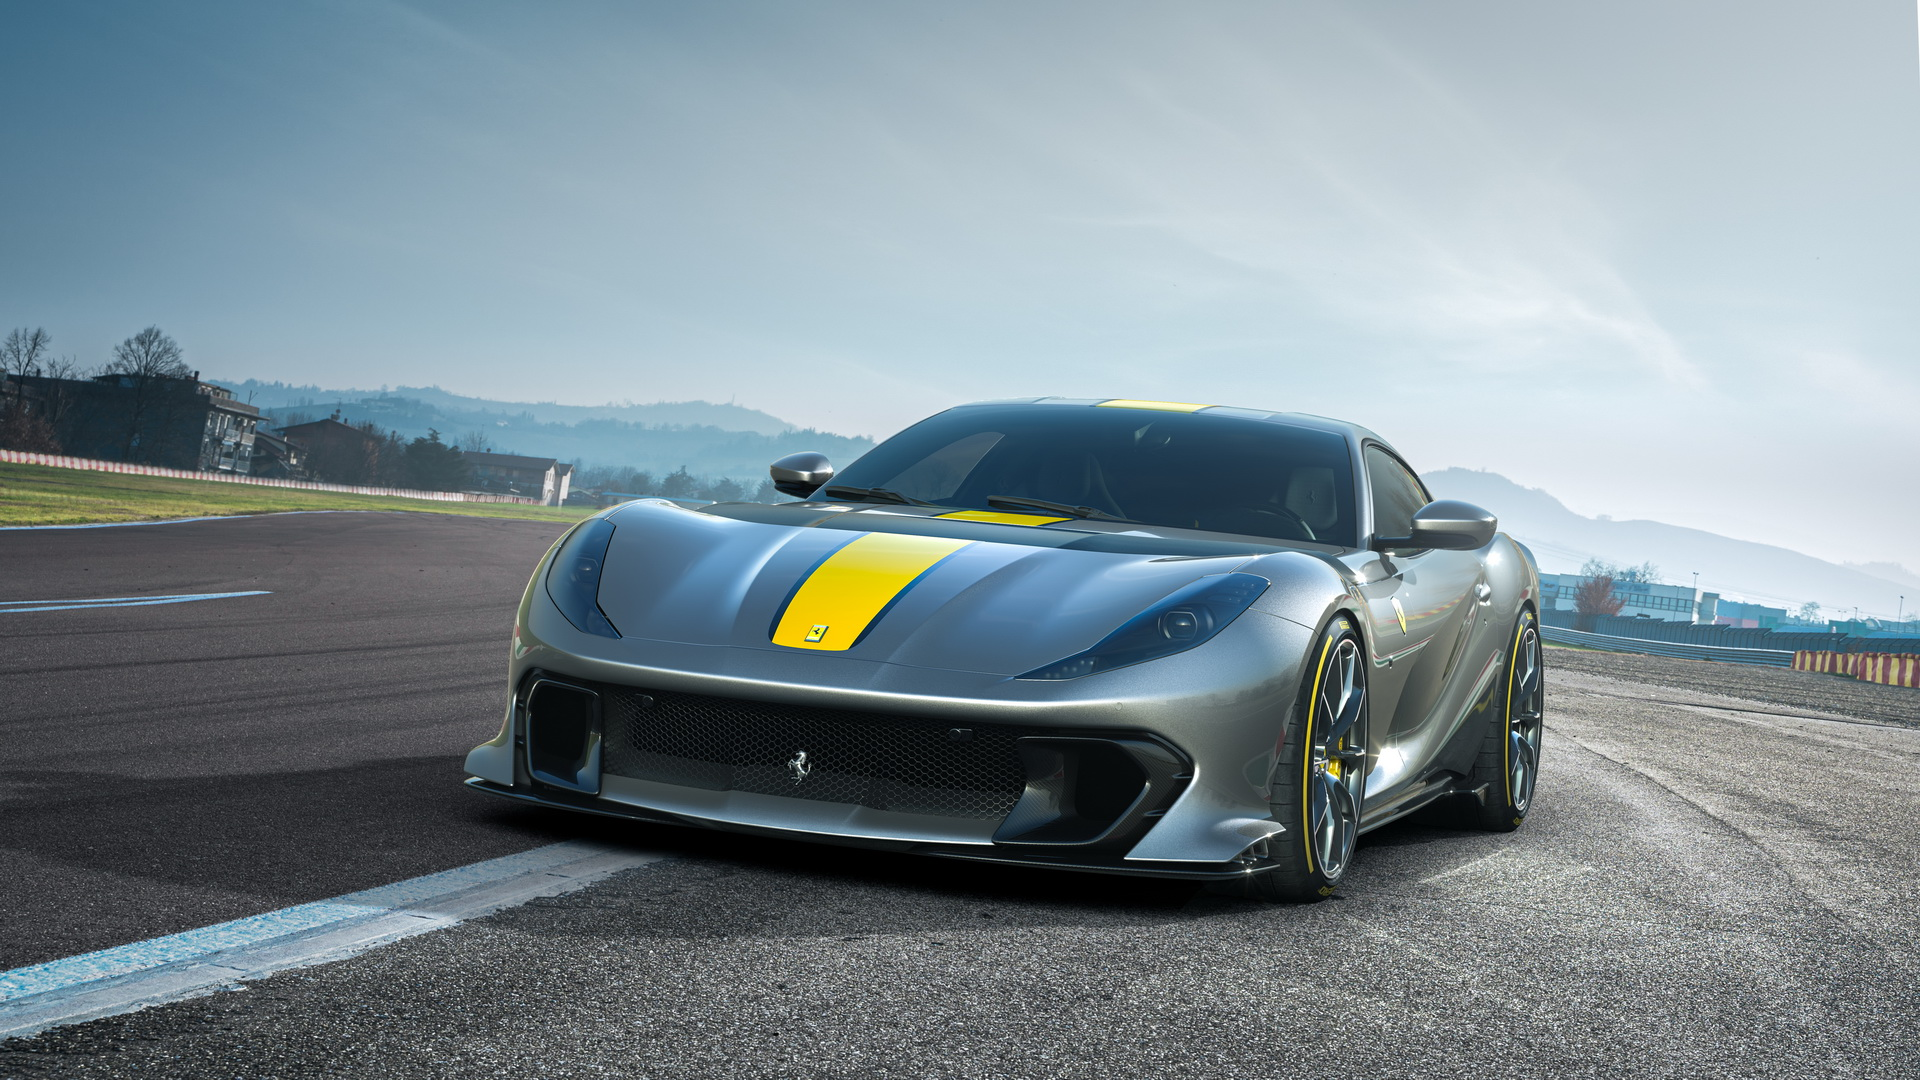 Ferrari-812-giới-hạn-ra-mắt (9).jpg